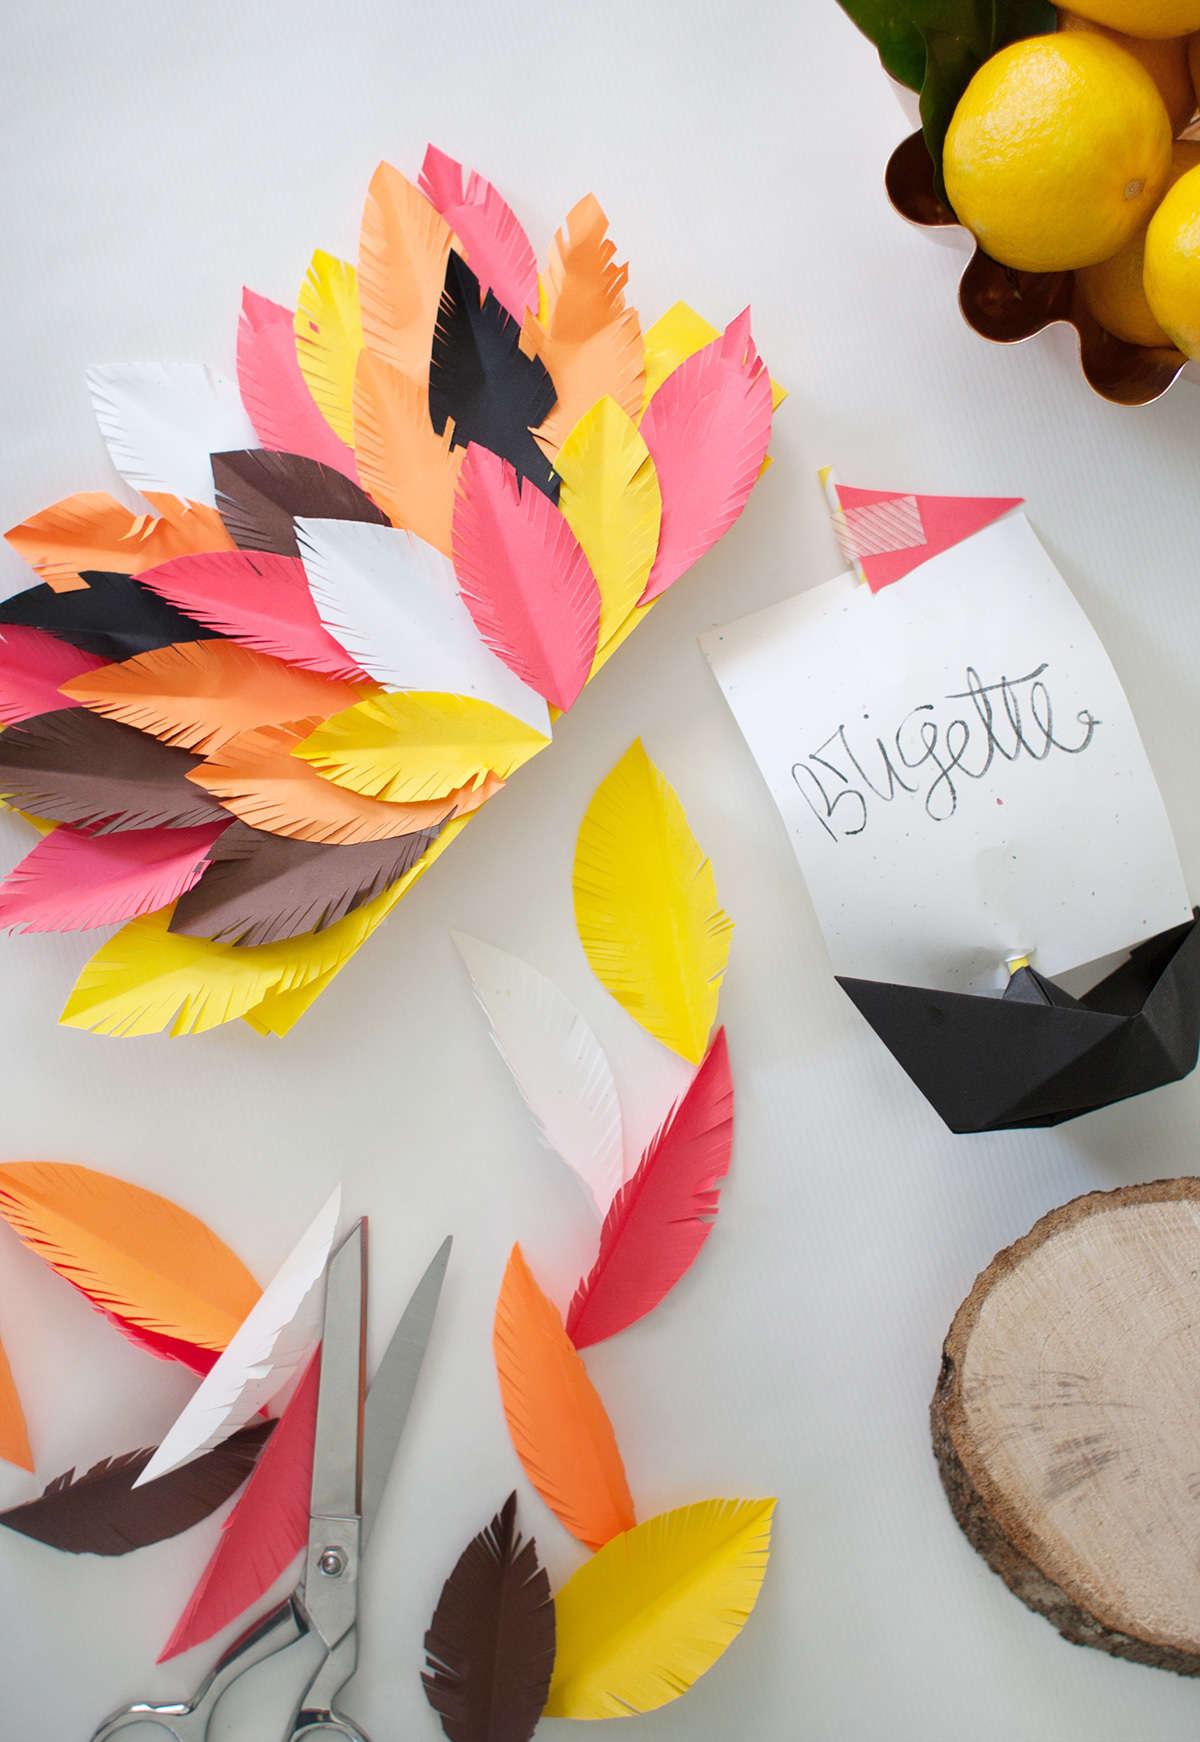 Diy thanksgiving paper decor - Thanksgiving Decor Ideas